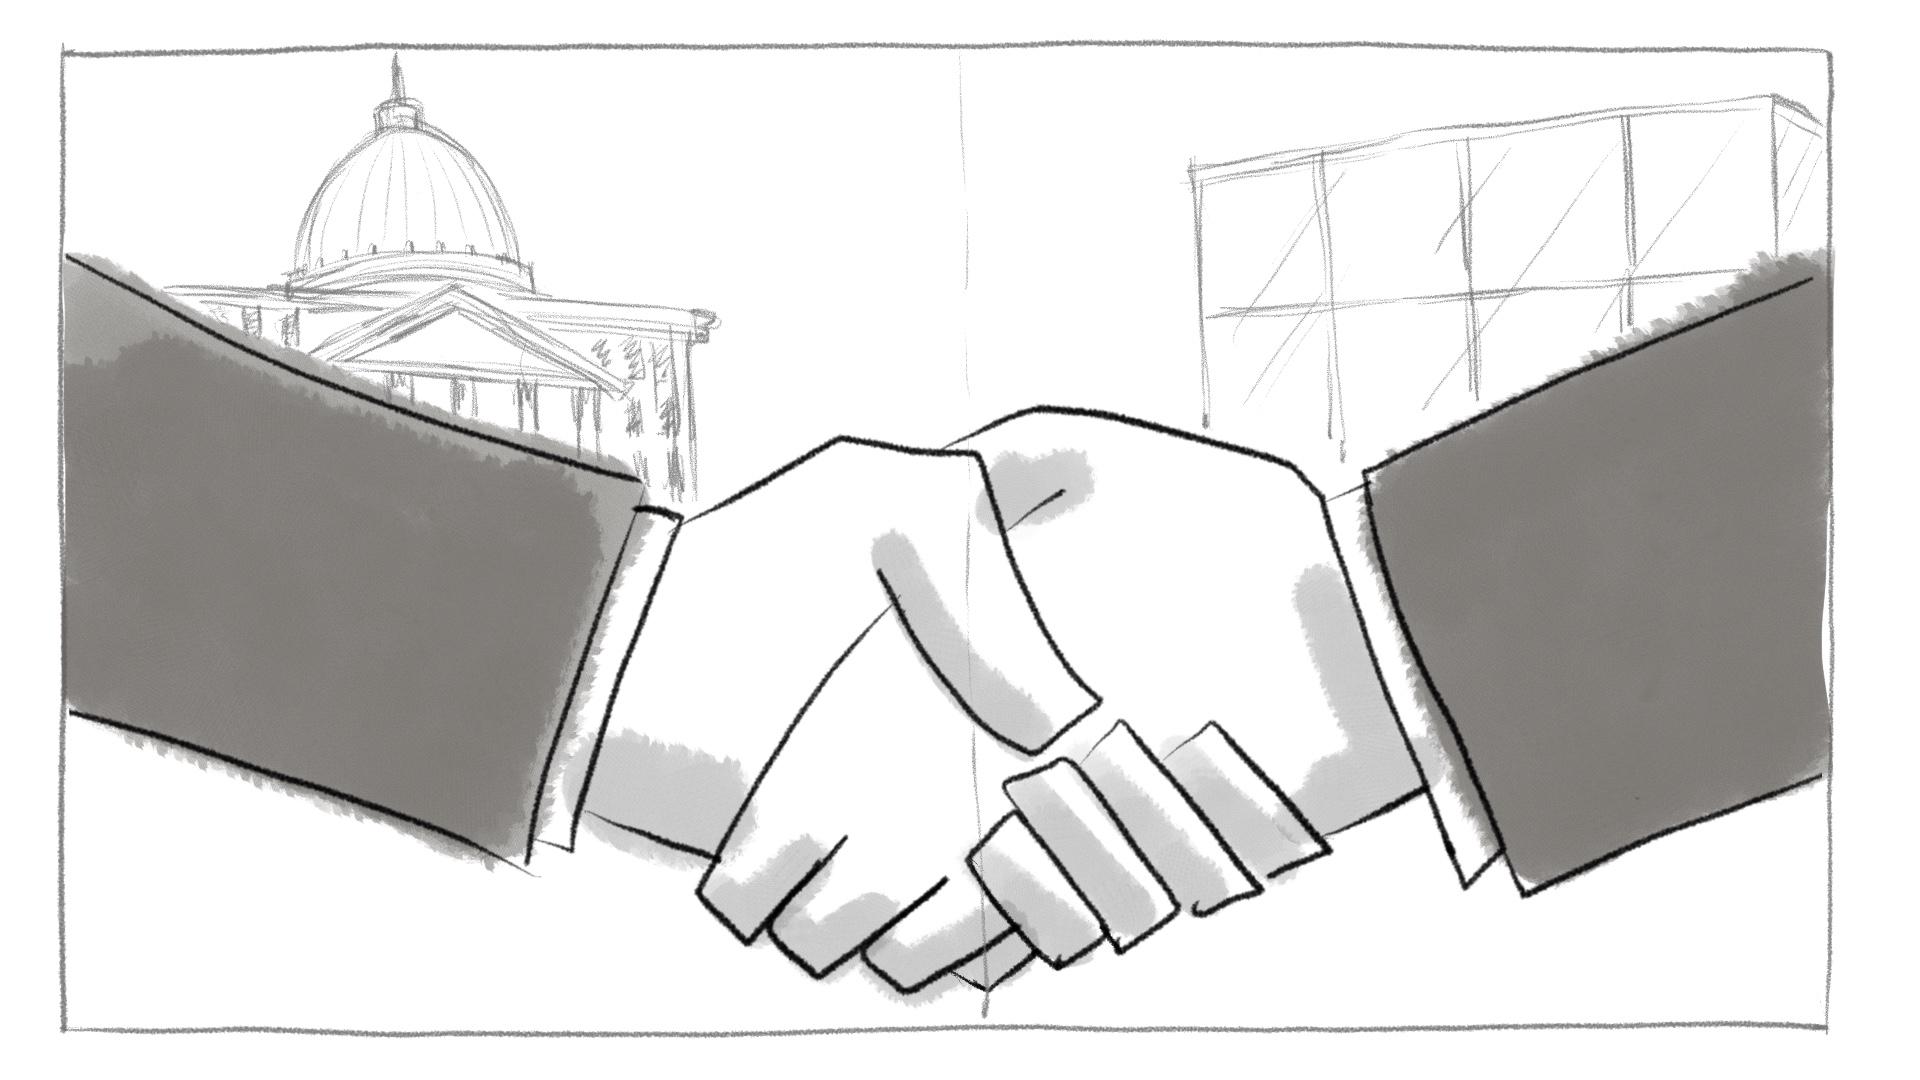 Shahidi_Storyboards_4c-2.jpg